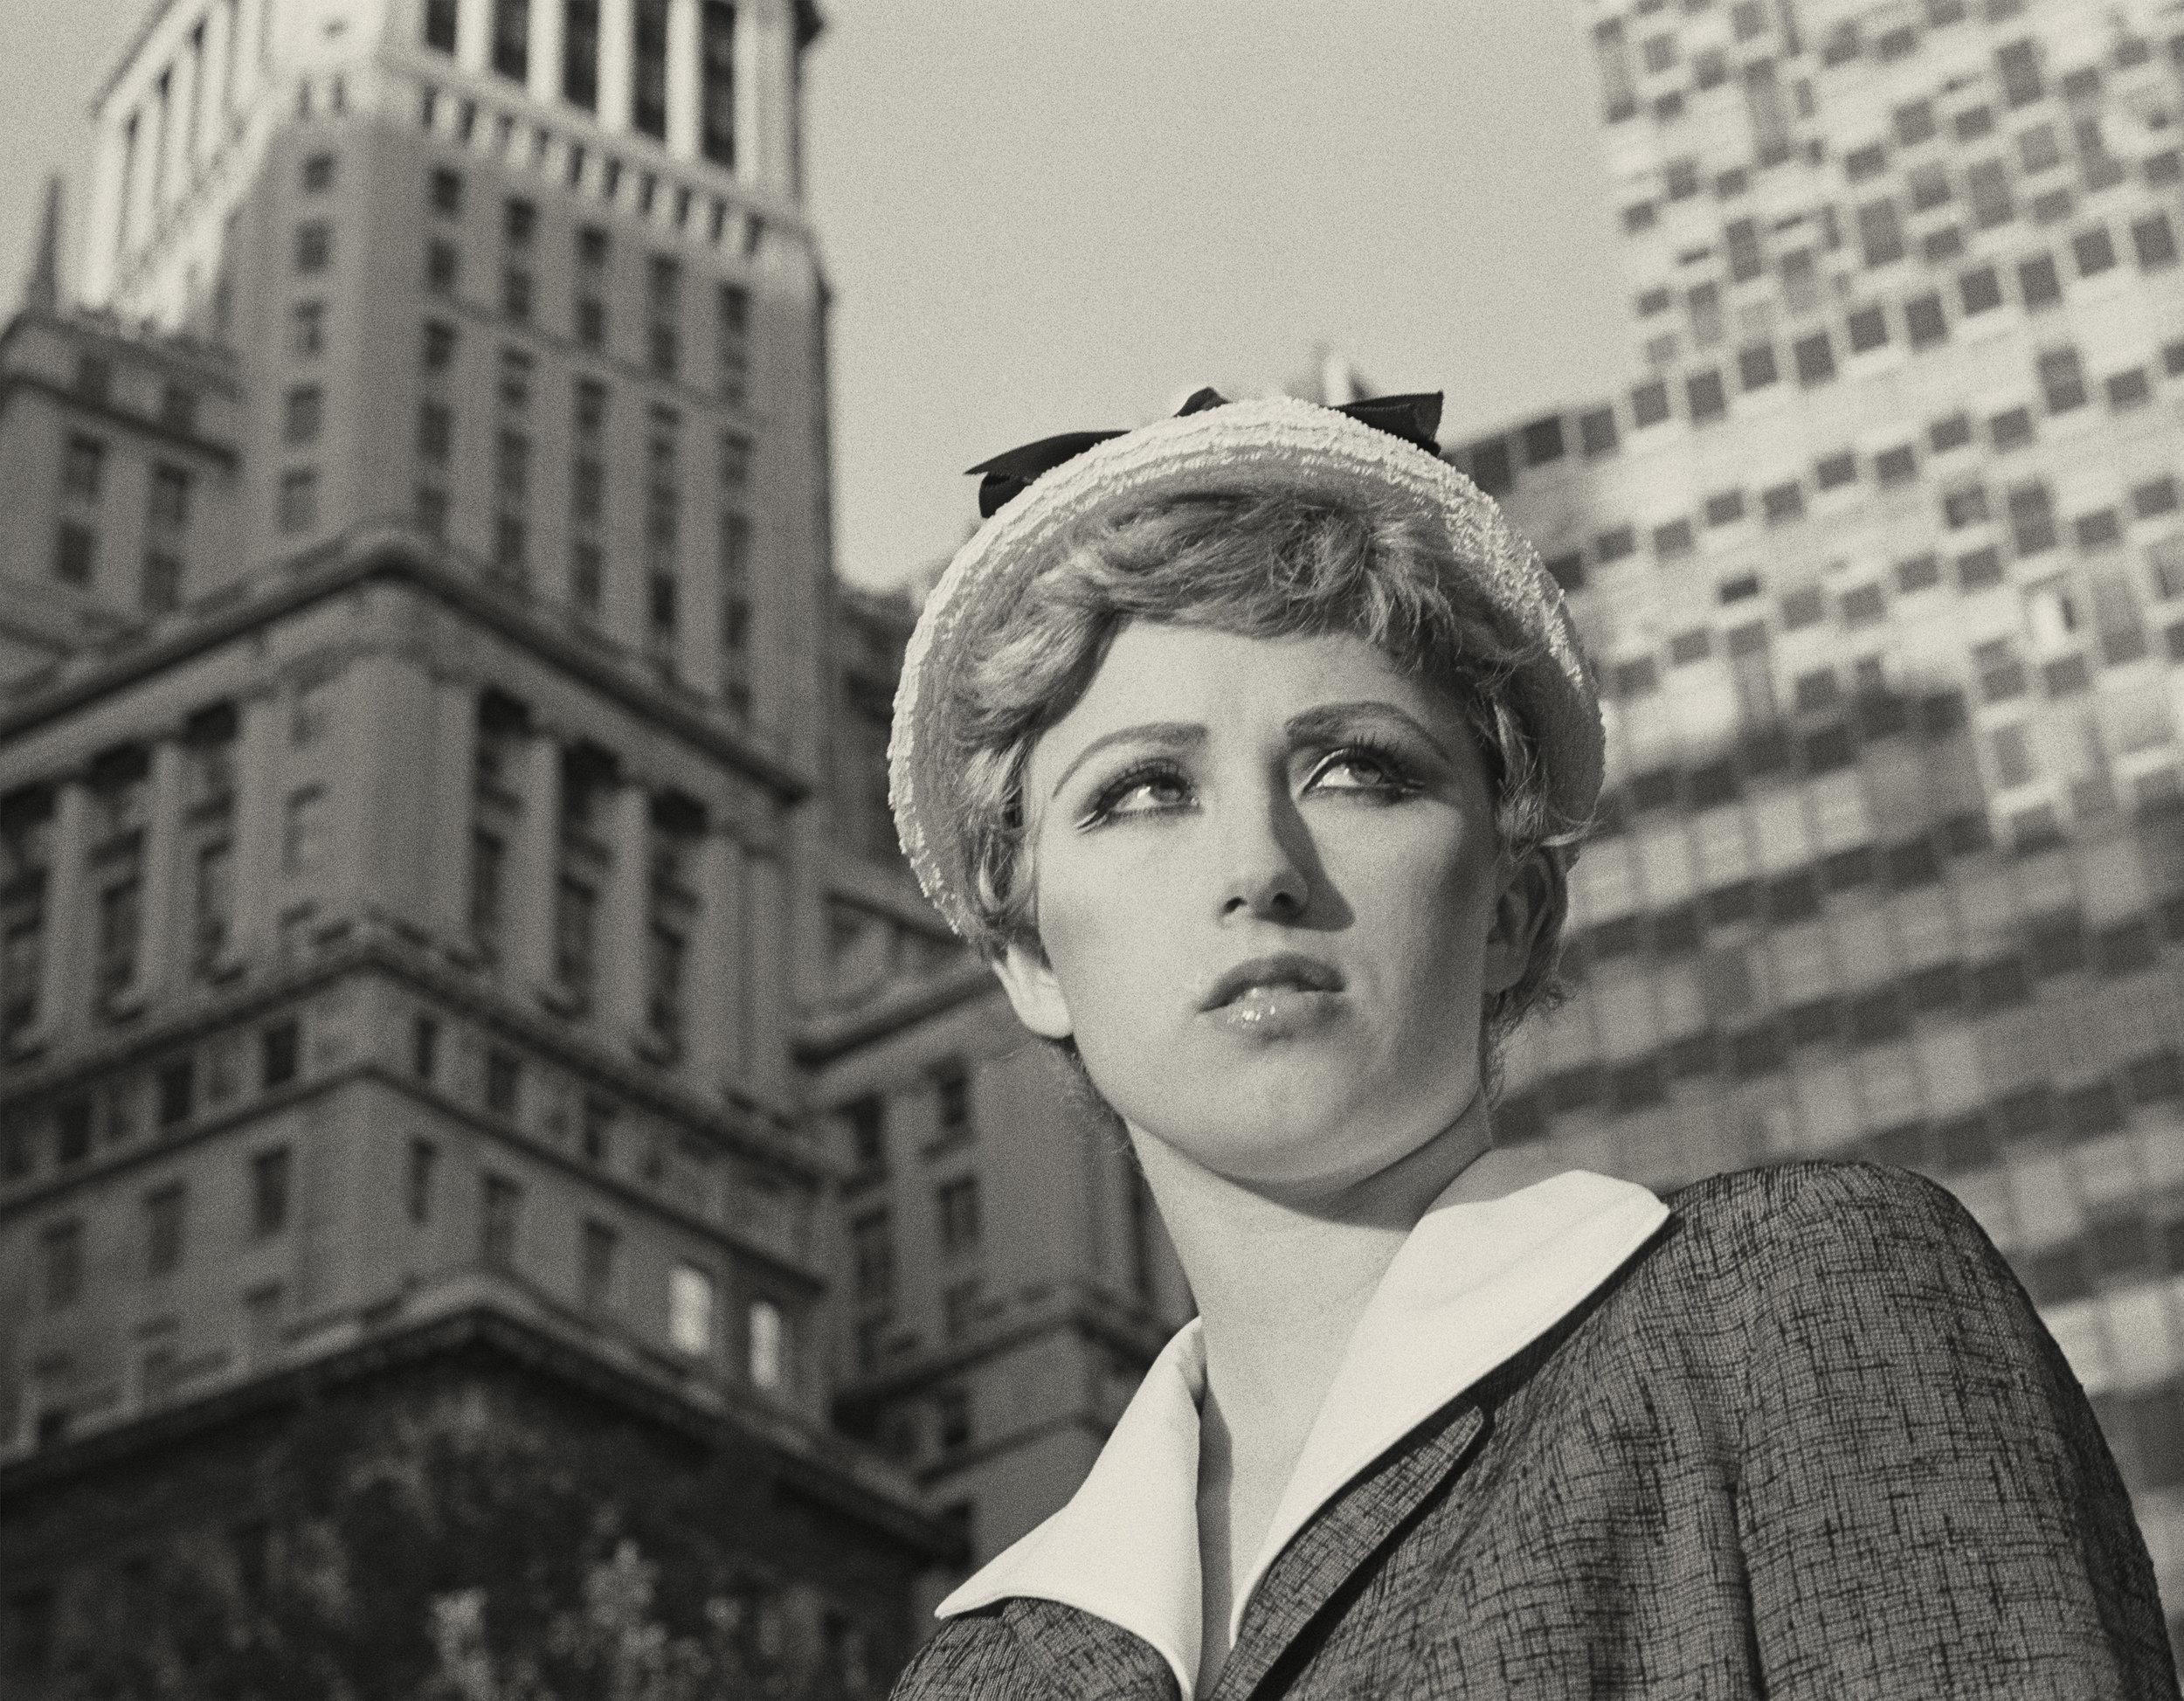 Untitled Film Still #21, Cindy Sherman. Courtesy of National Portrait Gallery